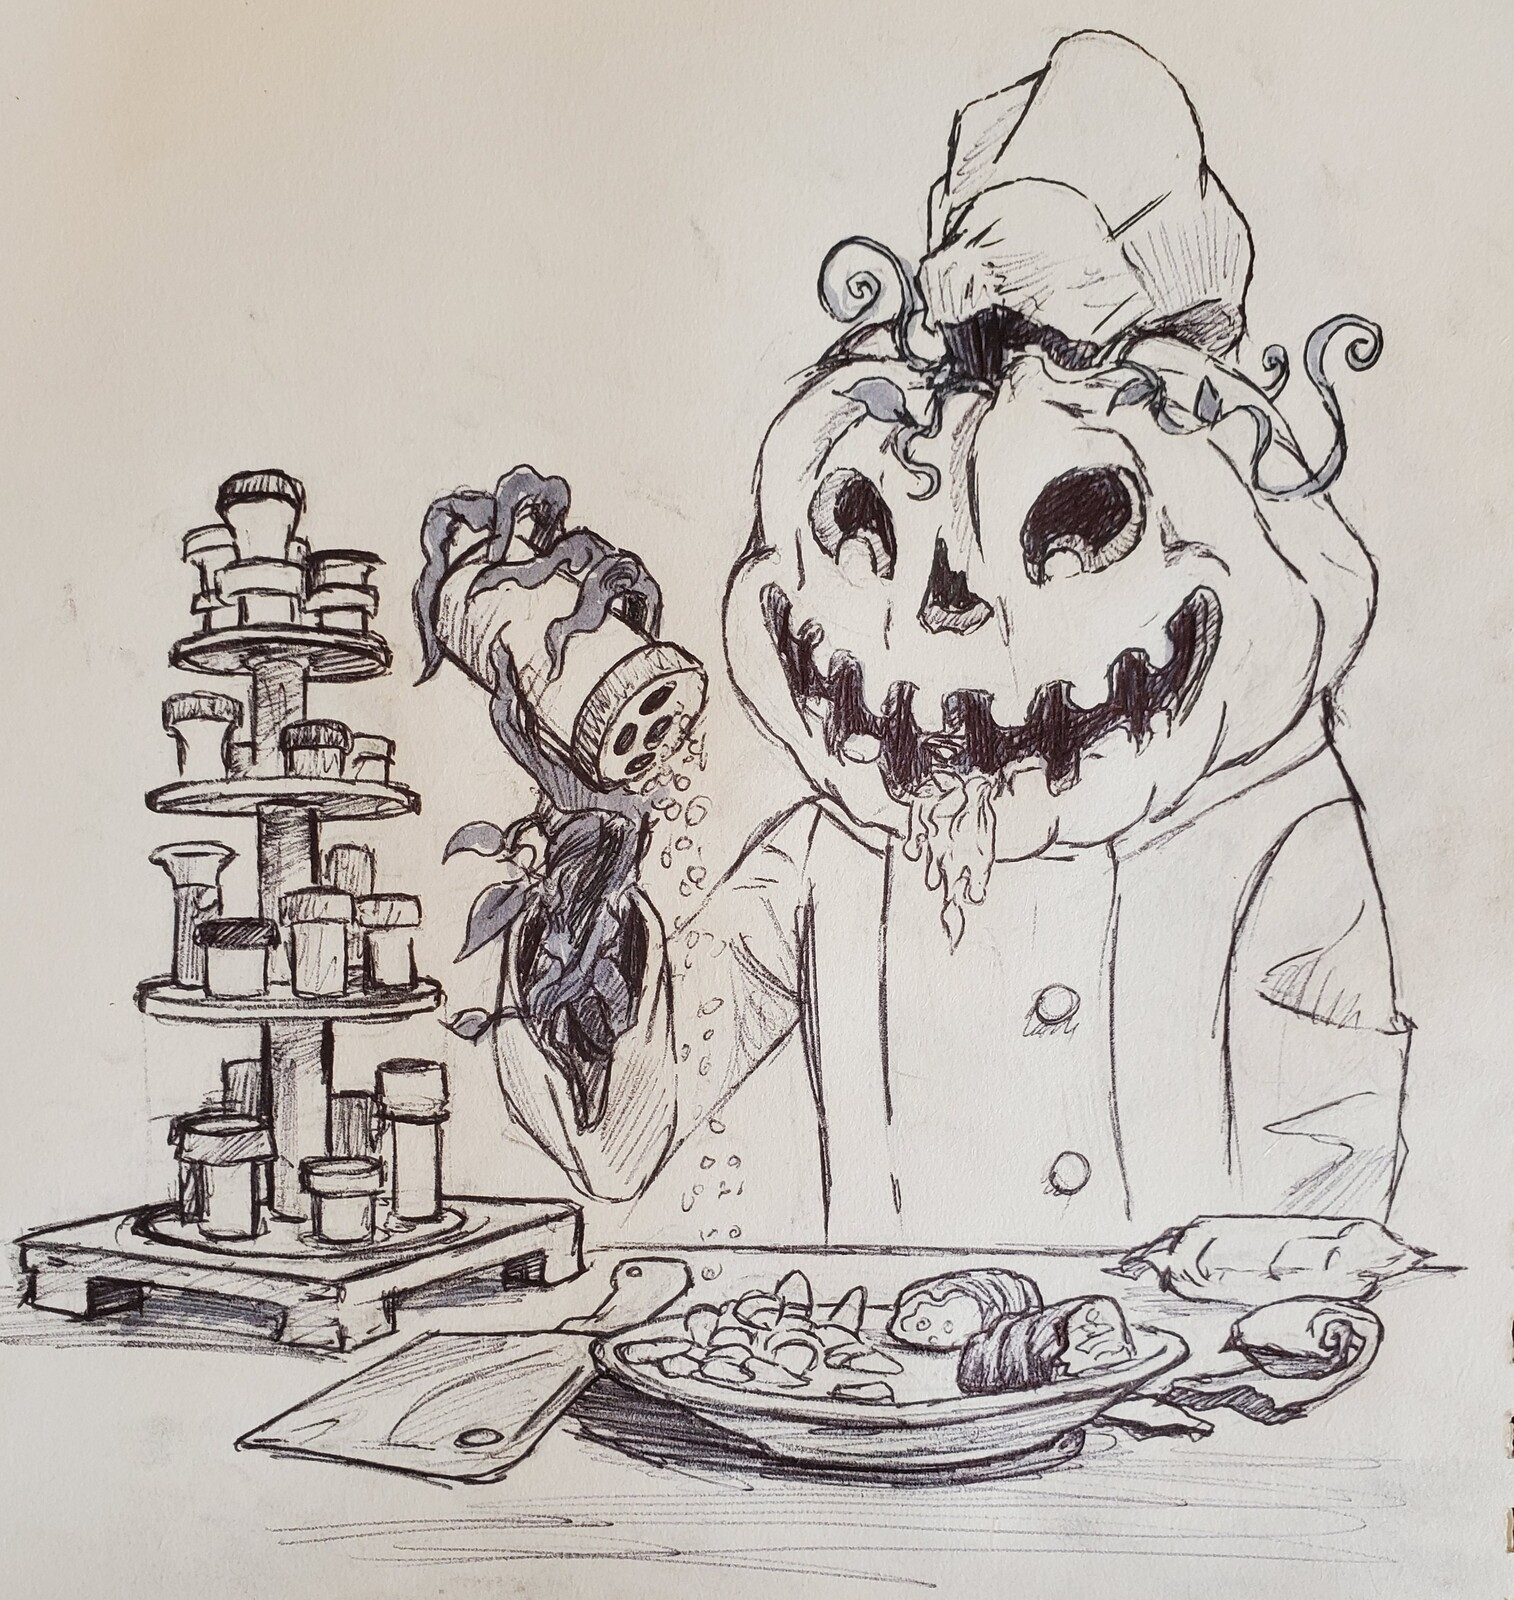 Inktober day 22: Chef